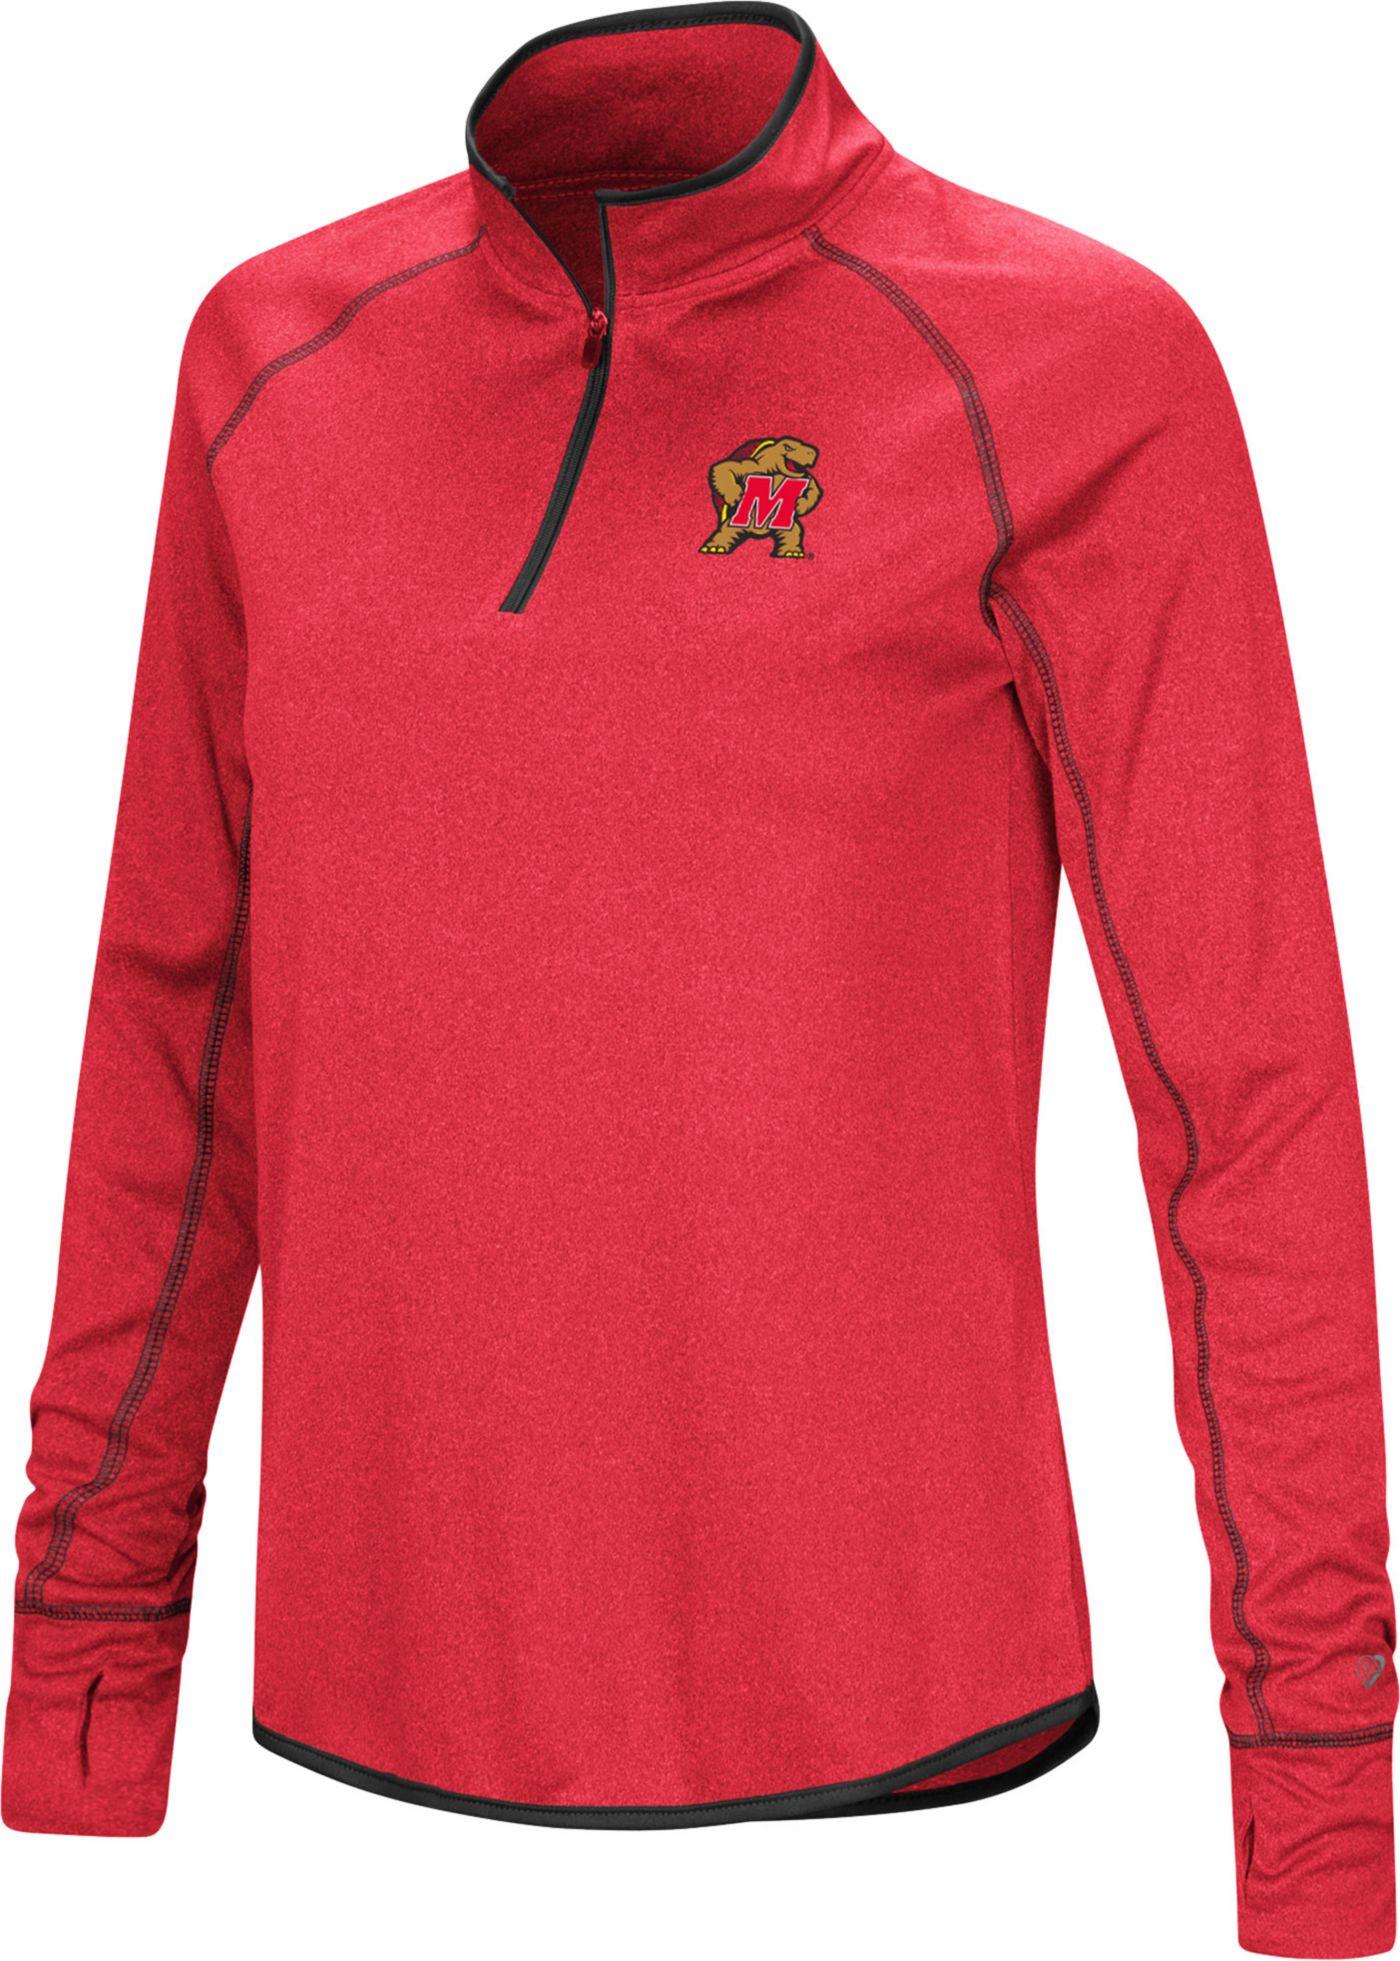 Colosseum Women's Maryland Terrapins Red Stingray Quarter-Zip Shirt